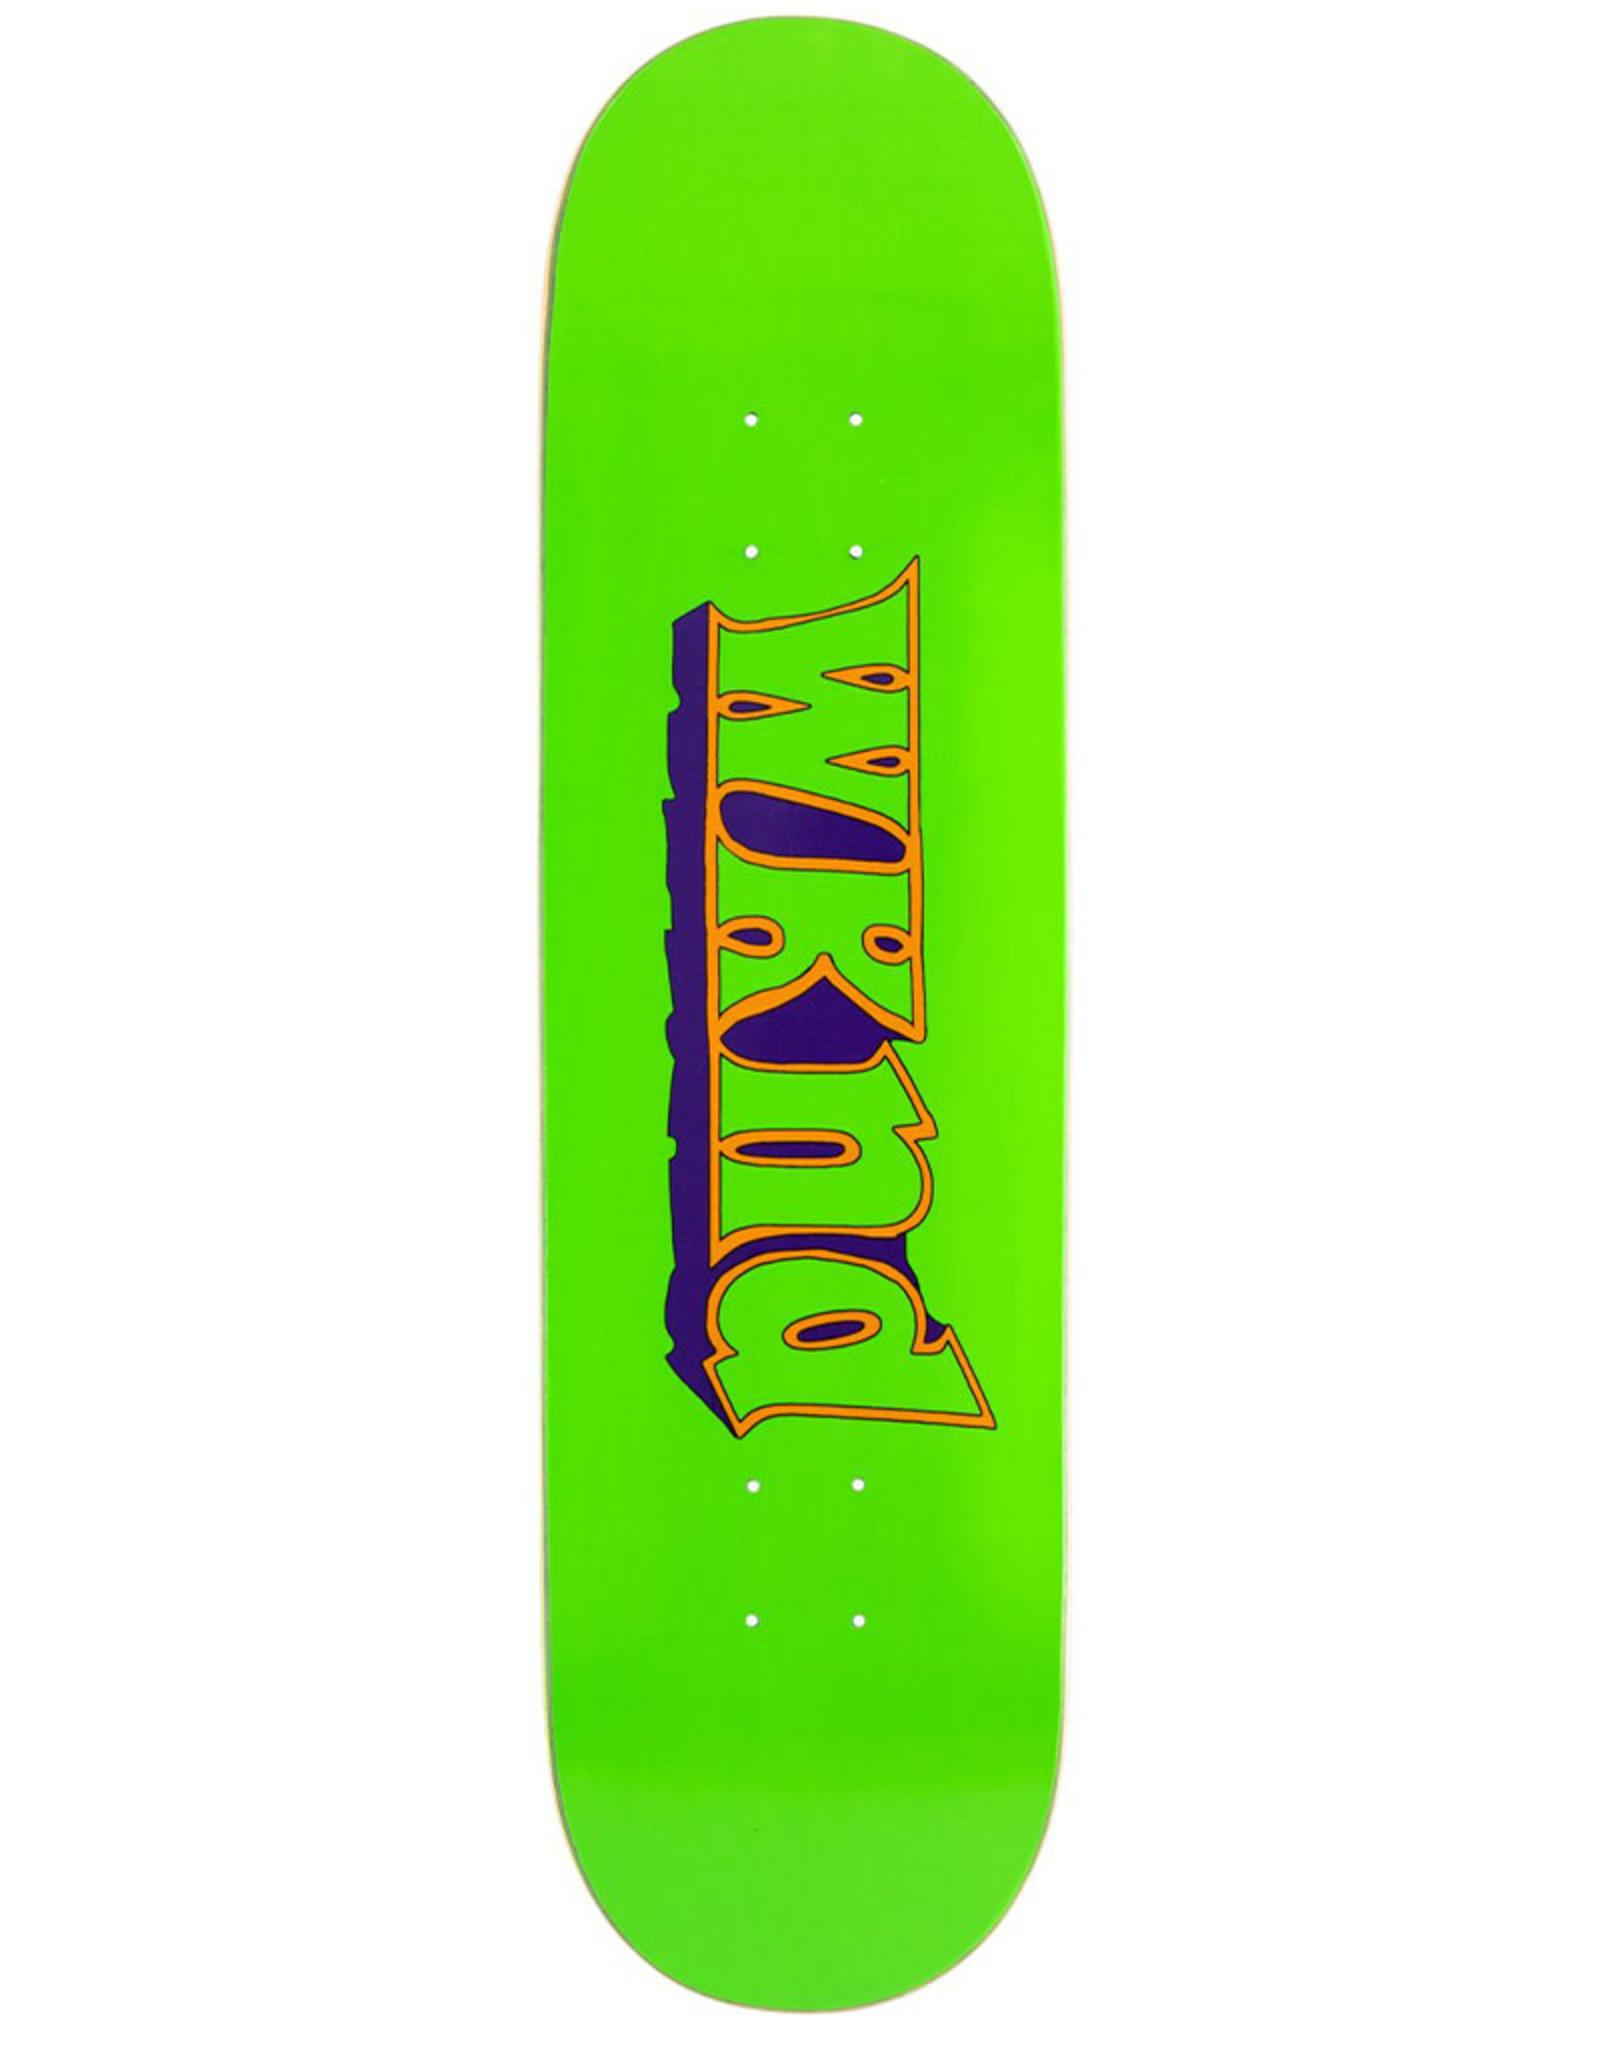 Wknd Skateboards Wknd Deck Team Good Times Green (8.75)